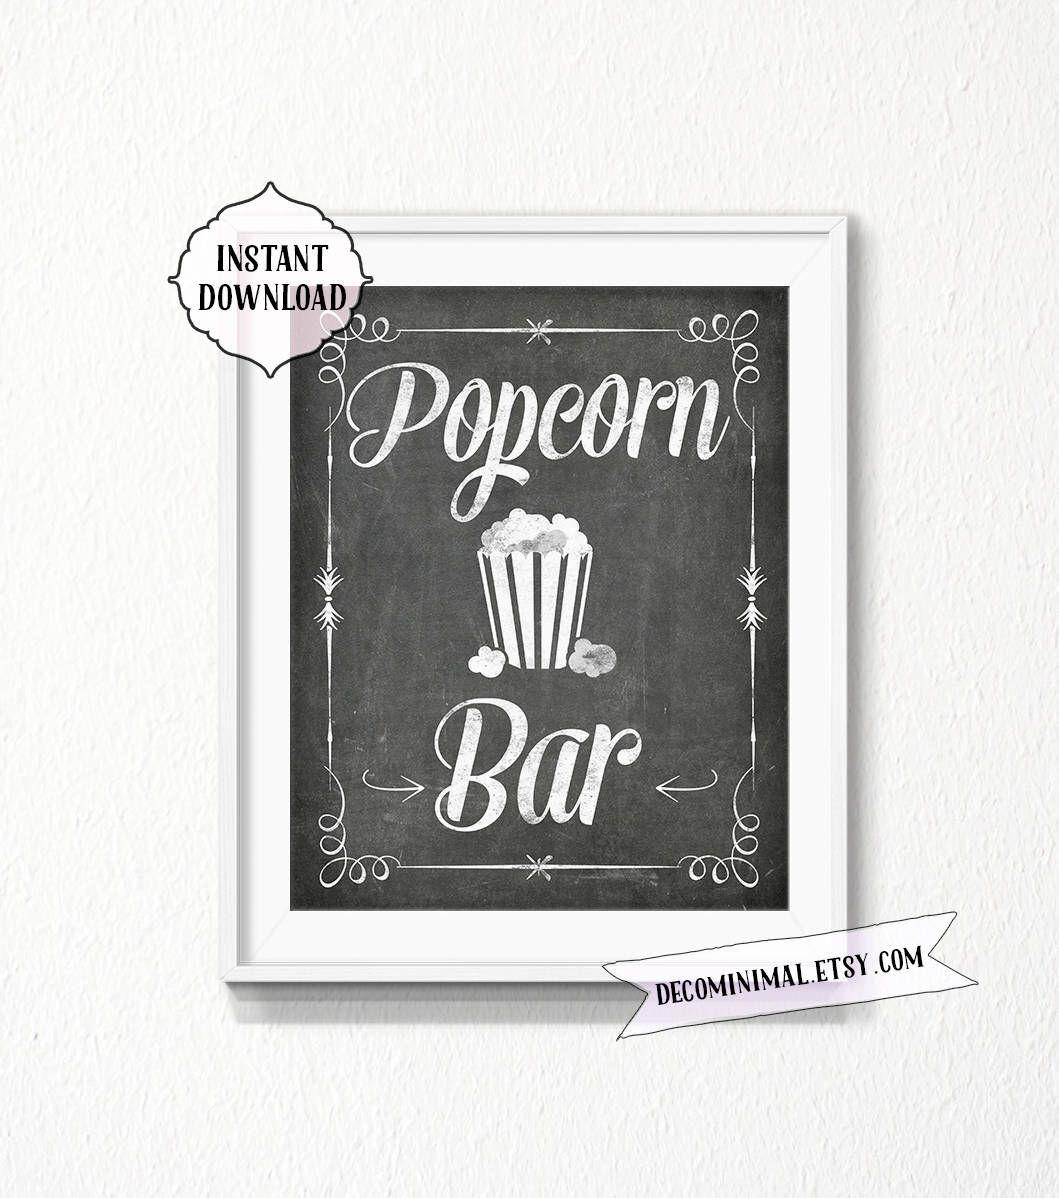 Popcorn bar, popcorn Sign, 11x14, 8x10, chalkboard, INSTANT download ...